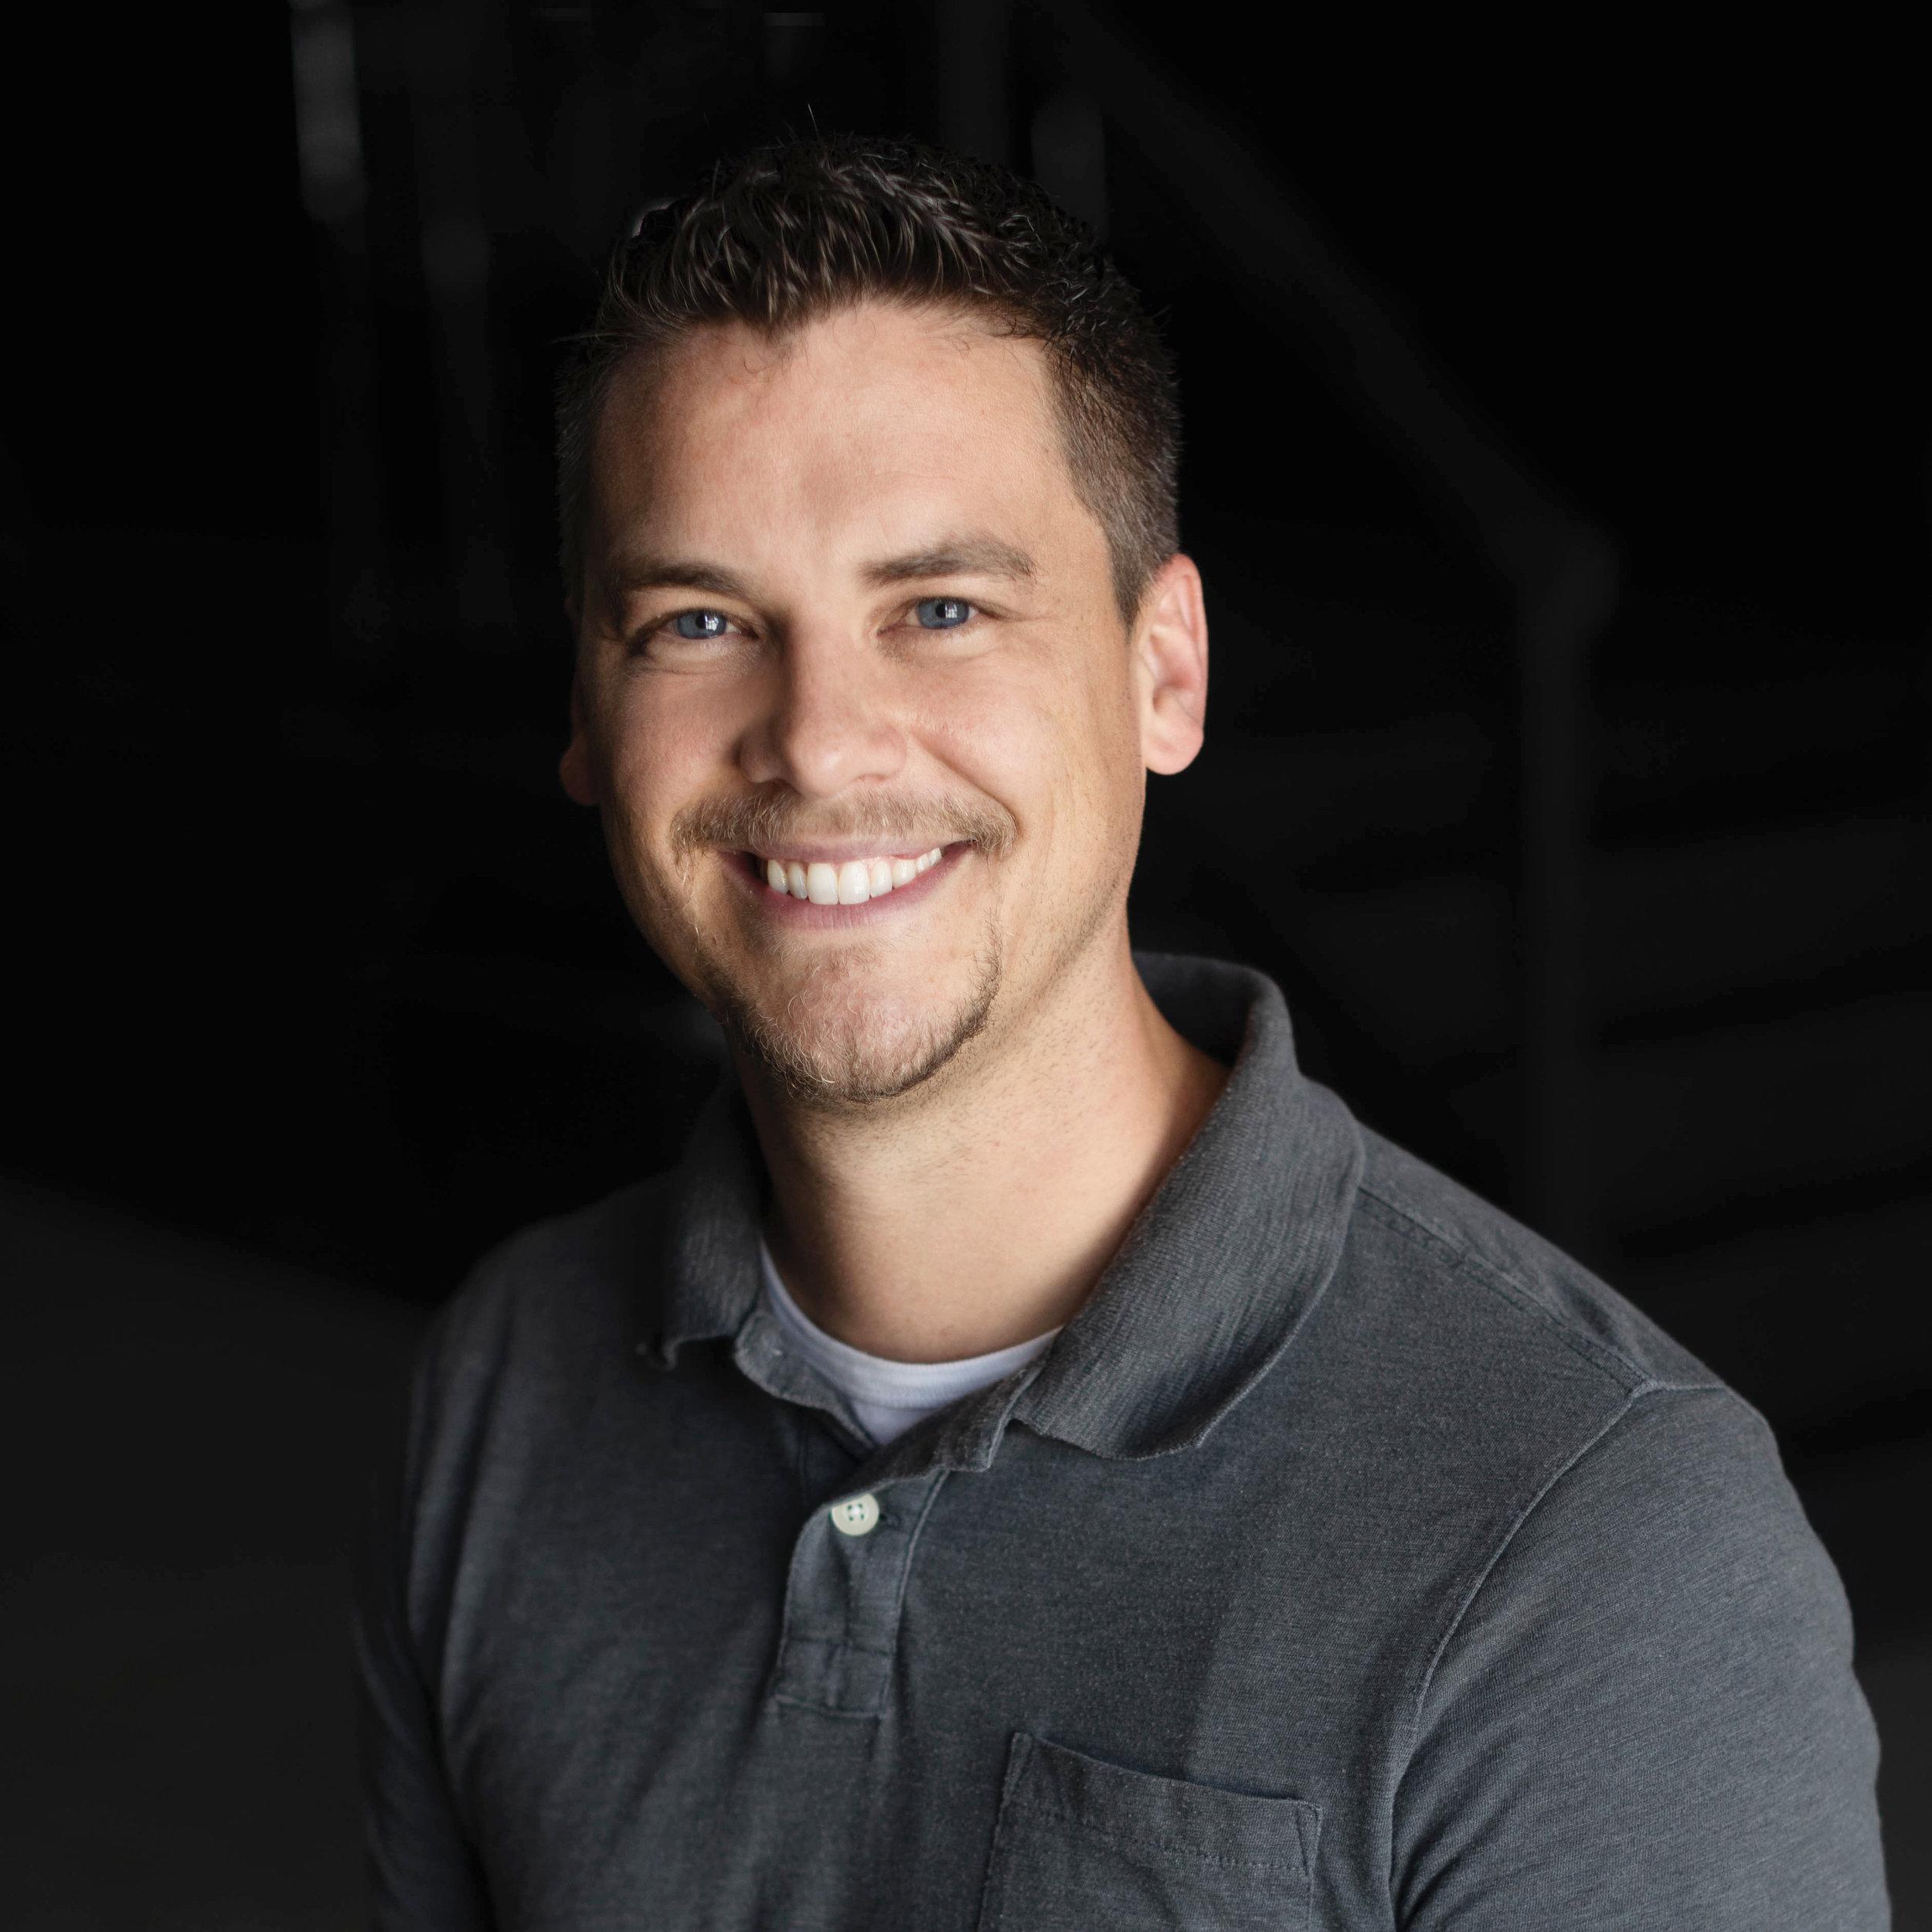 Lead Elder - Grant Radebaugh